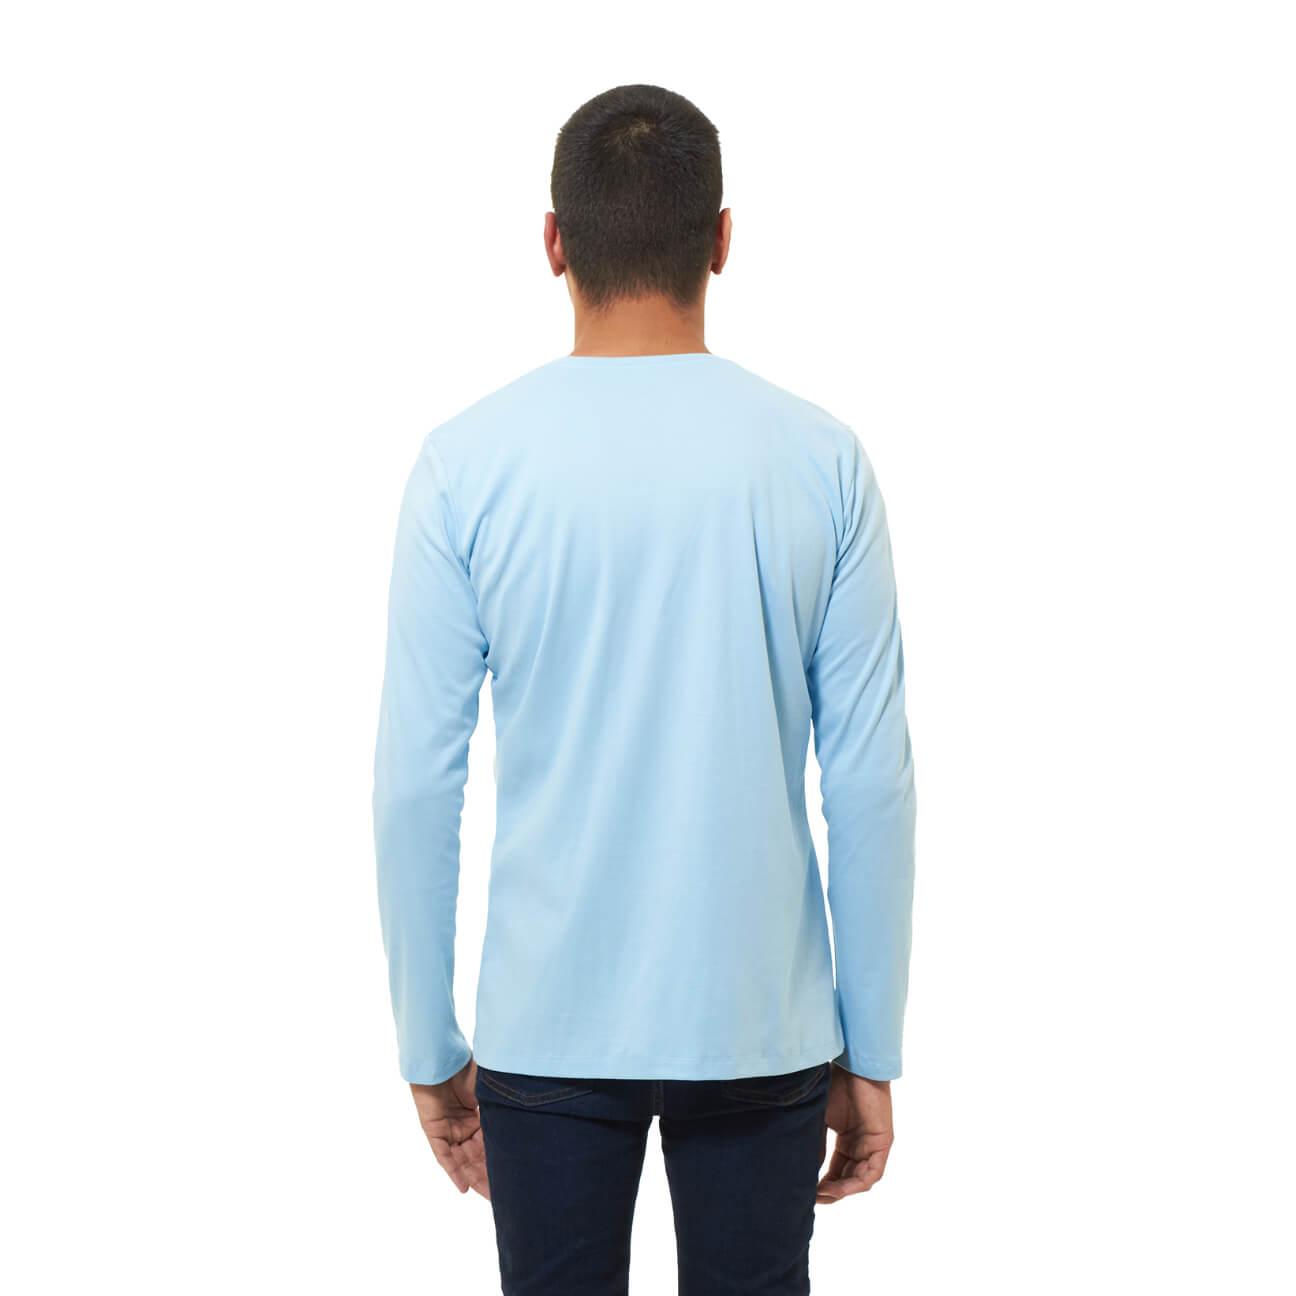 Franela basica caballero manga larga azul claro espalda